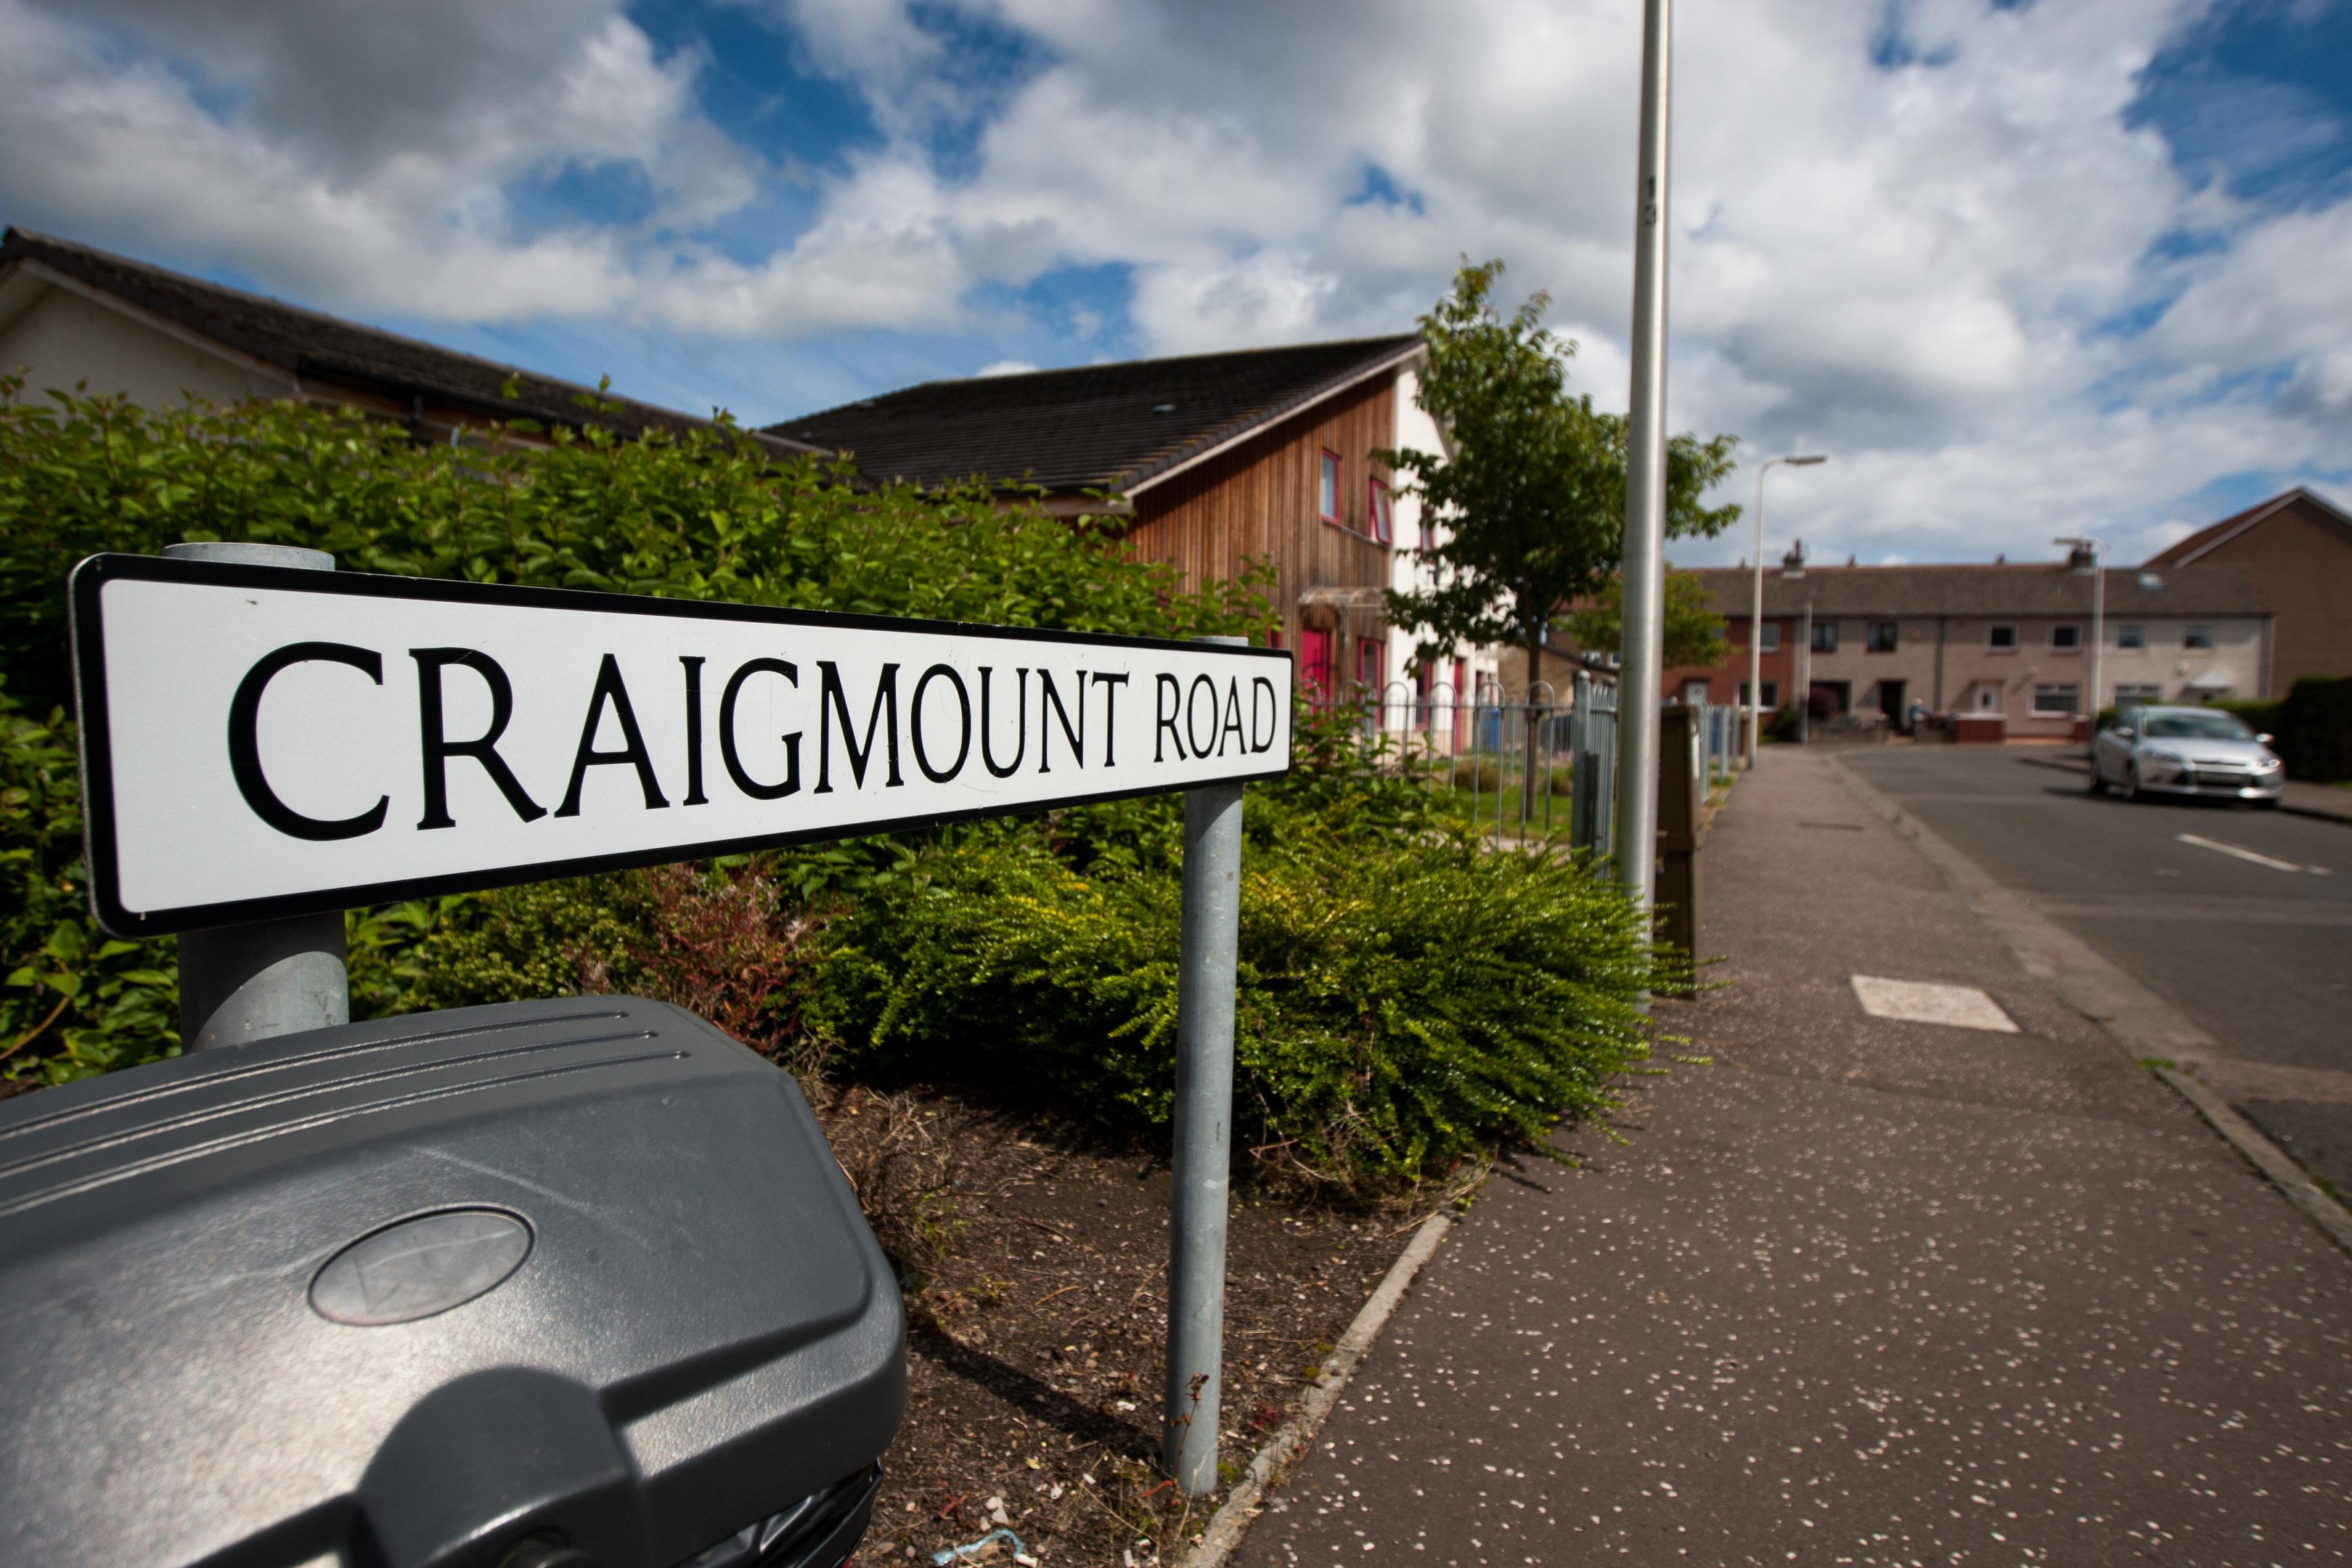 Craigmount Road (Stock image).